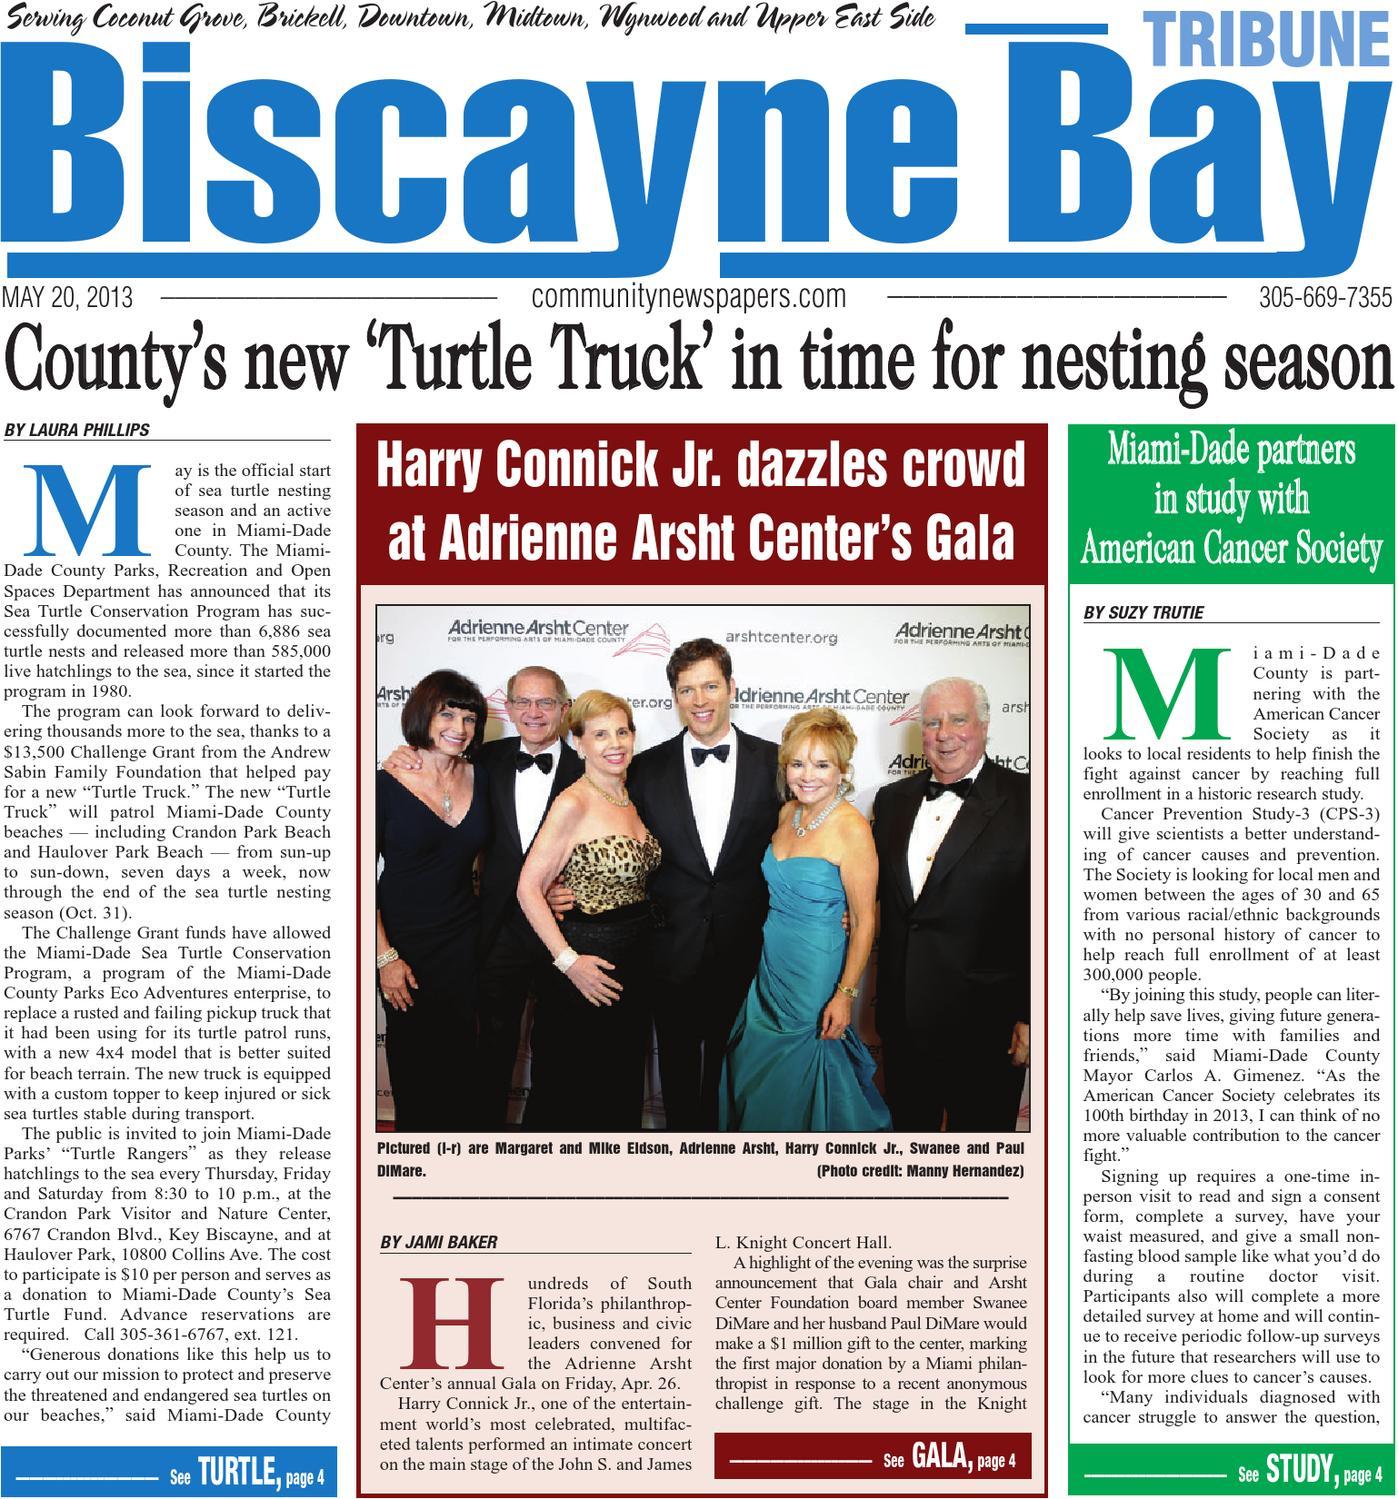 Biscayne Bay Tribune 5 20 2013 by munity Newspapers issuu